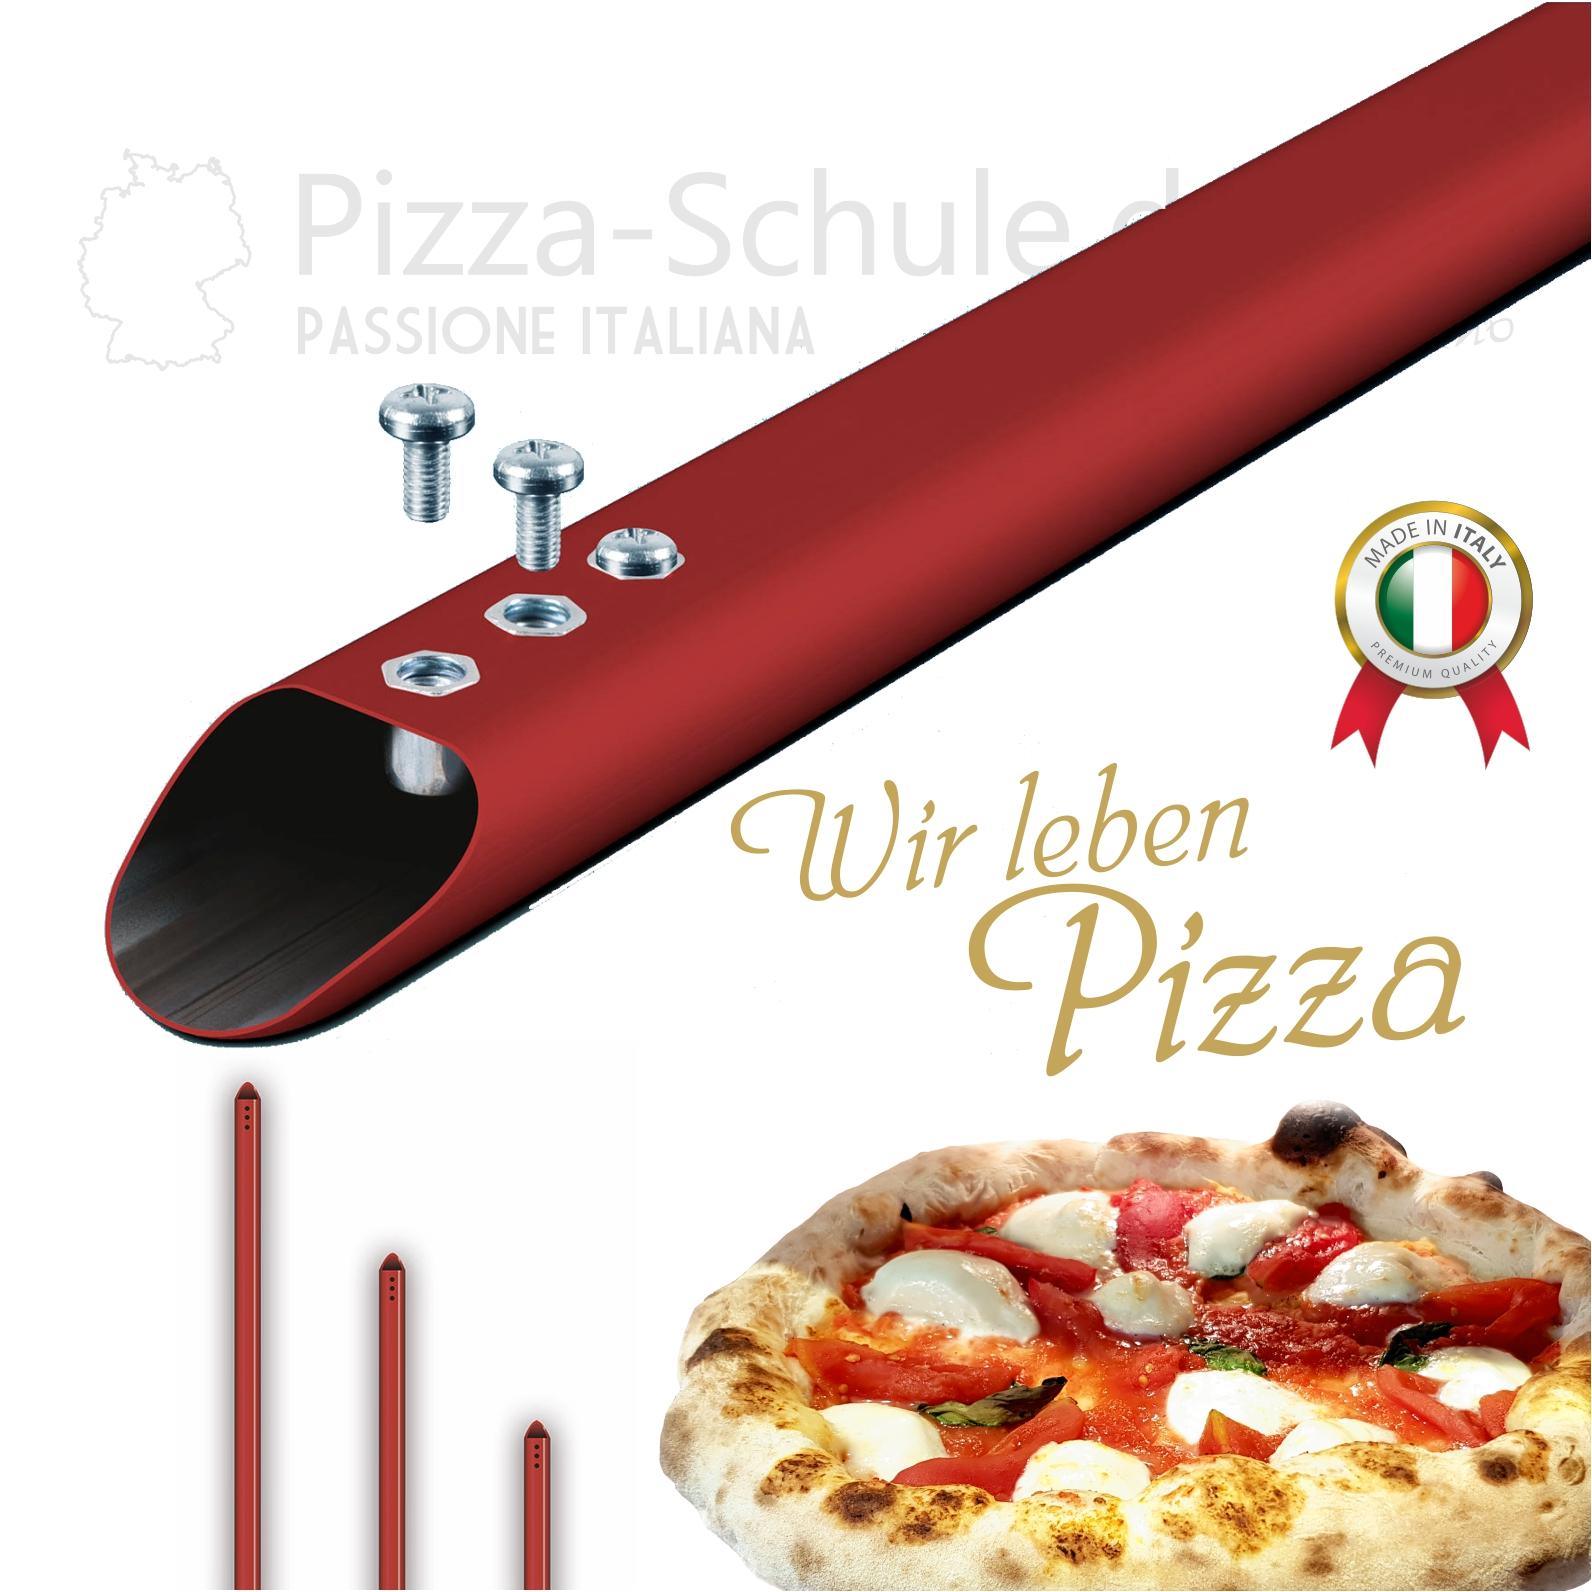 Aluminiumgriff für all unsere Pizza Schaufeln